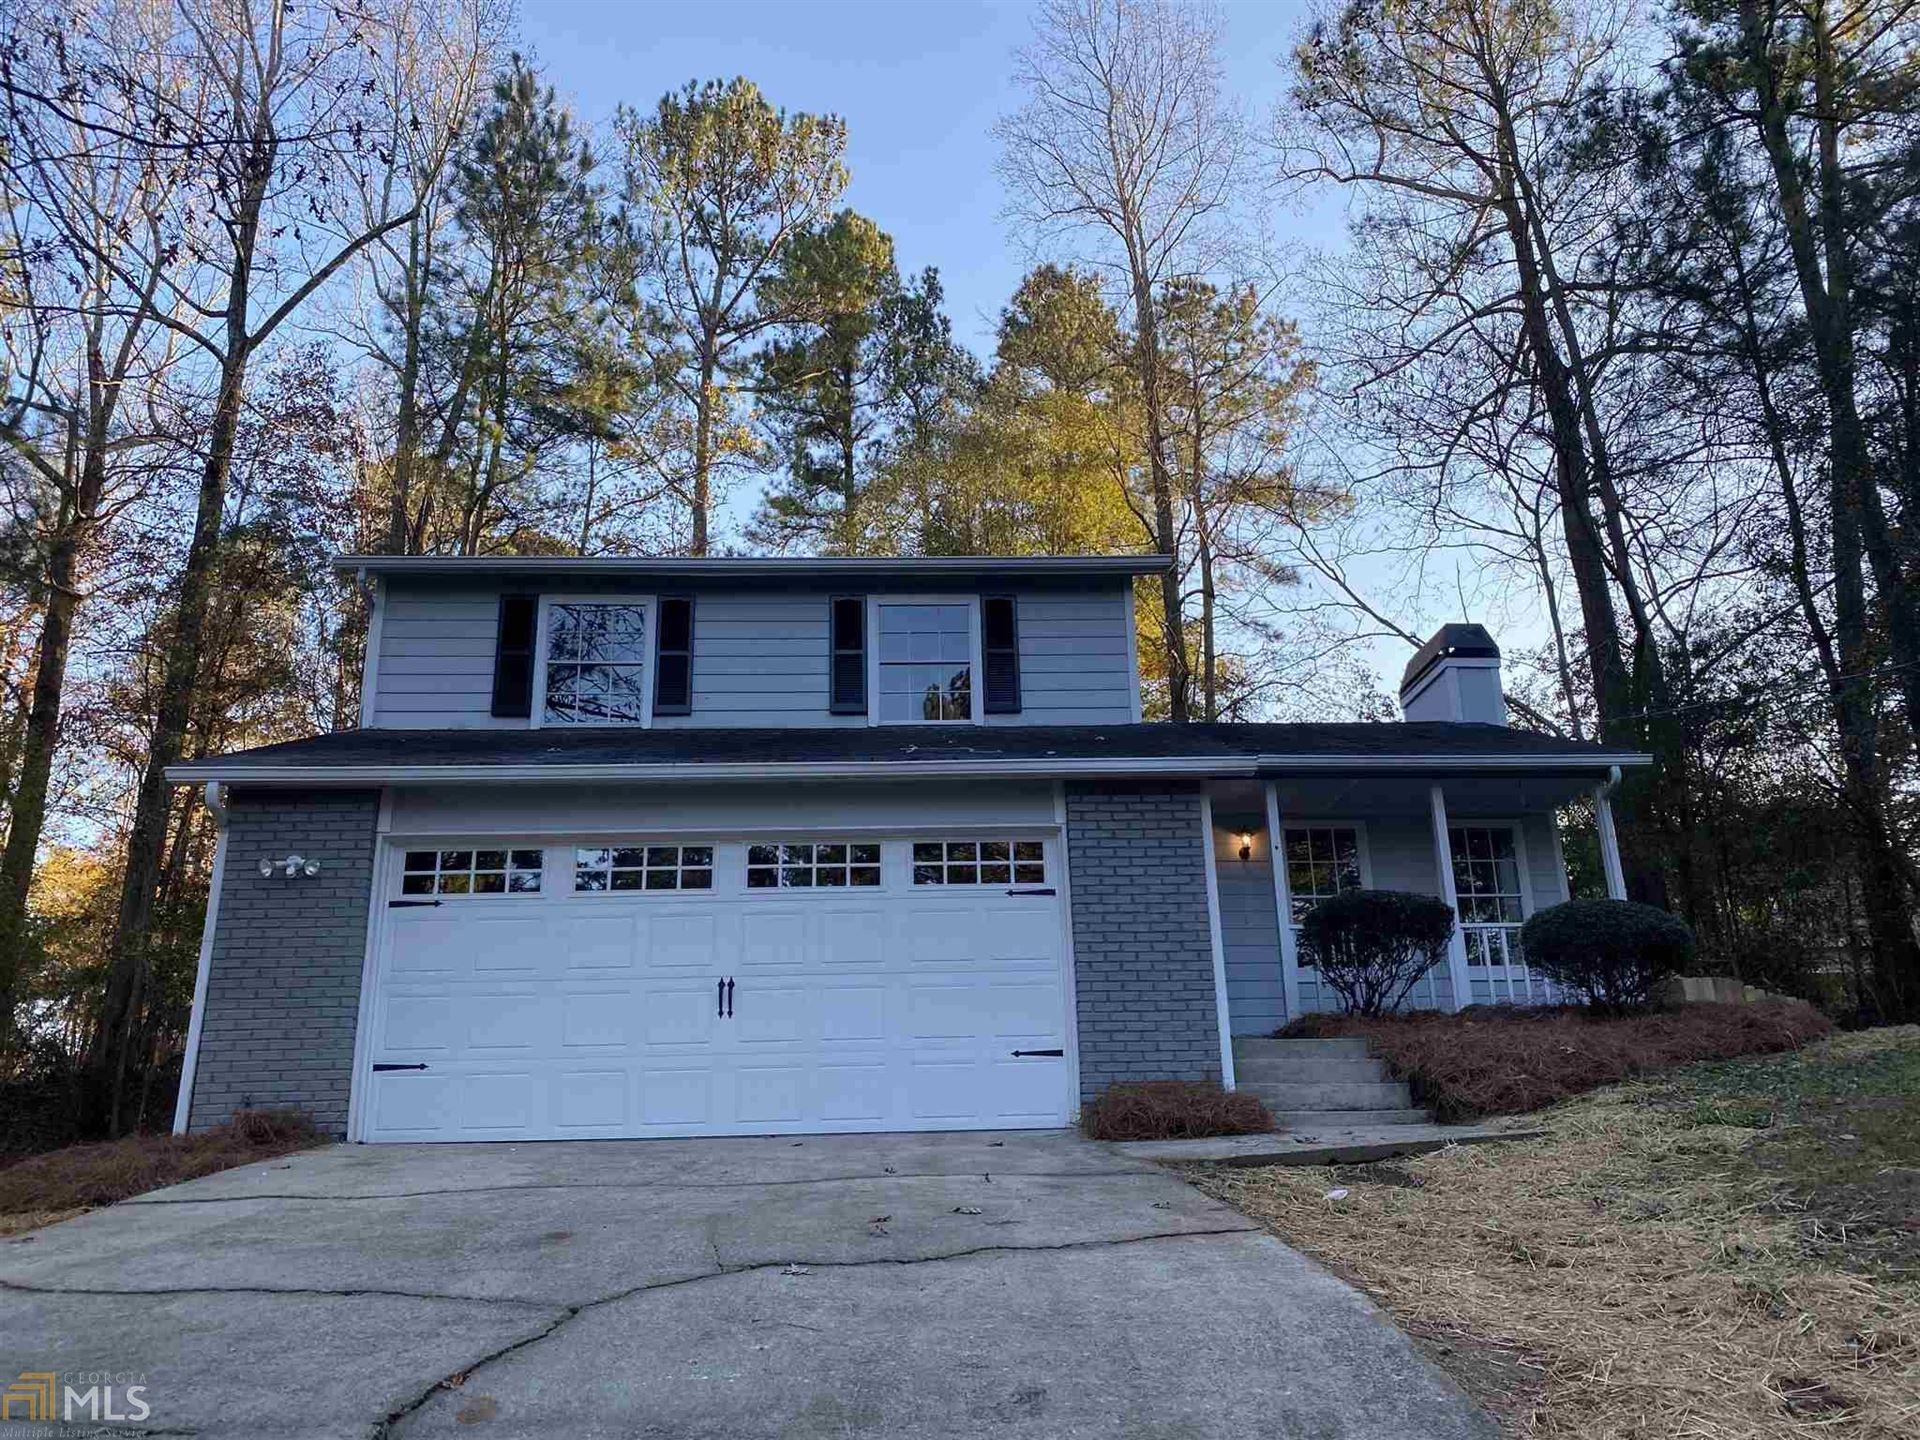 1551 Pin Oak Ln, Conyers, GA 30094 - MLS#: 8900993